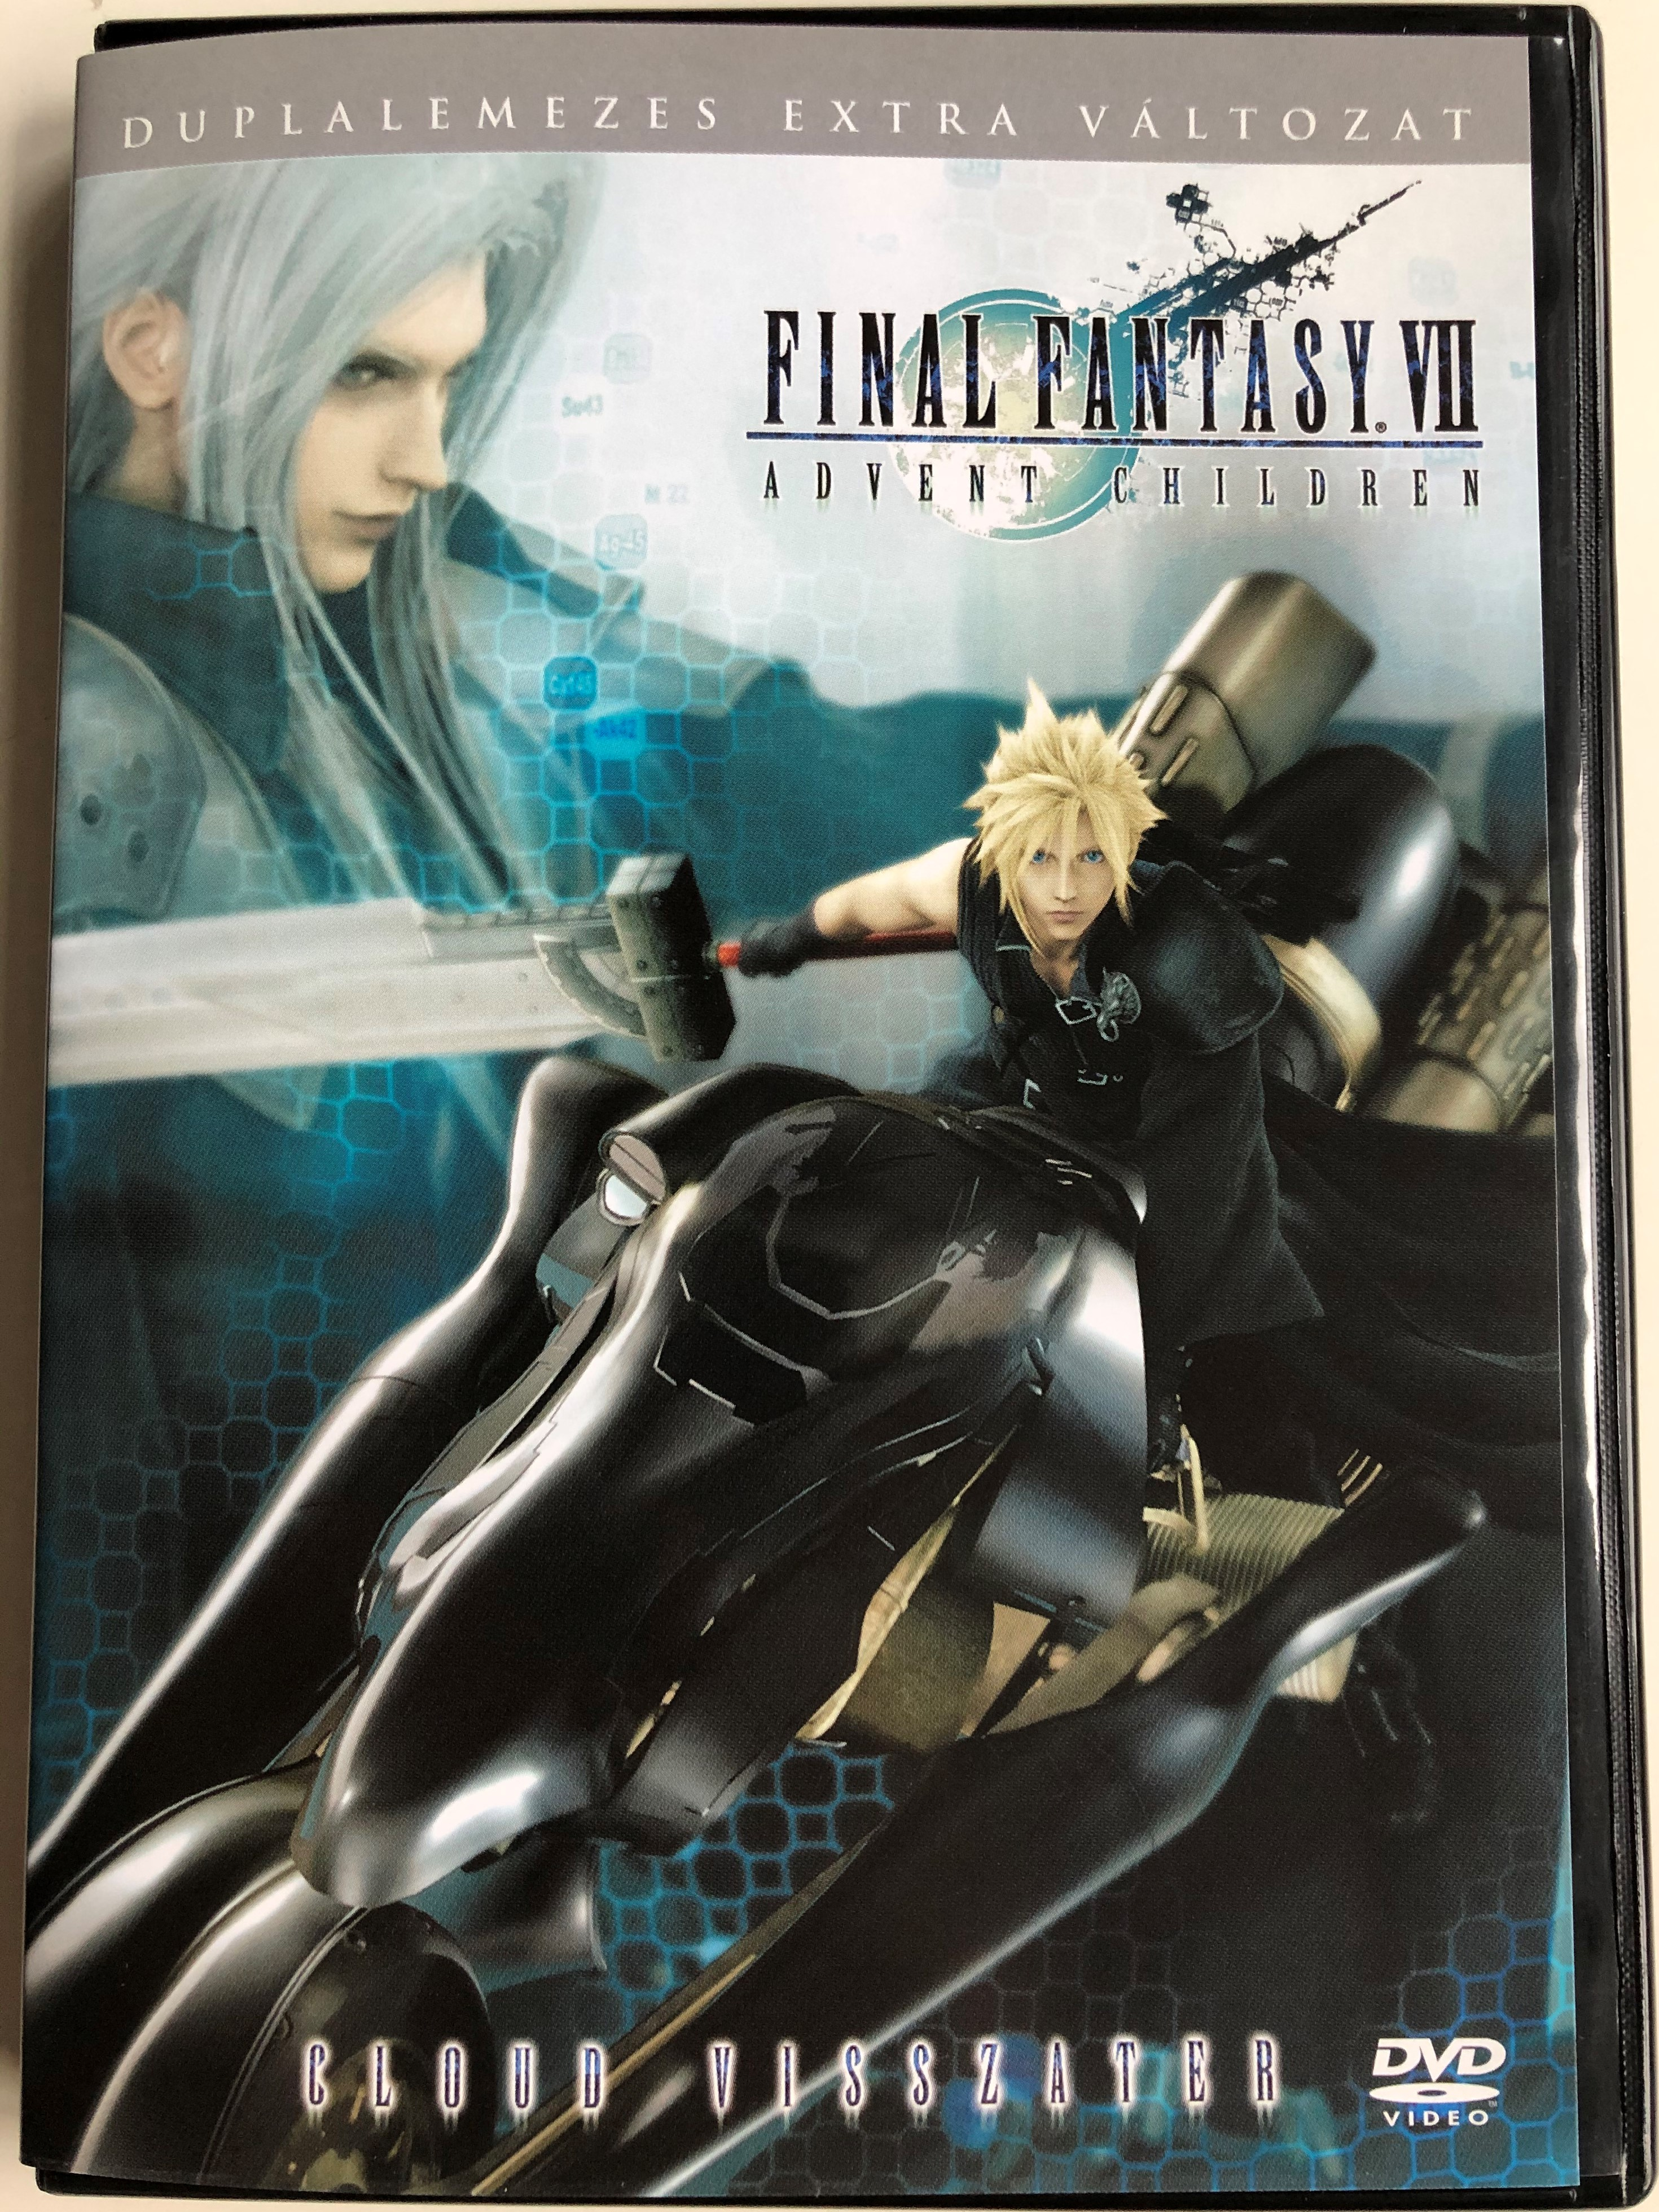 final-fantasy-vii-advent-children-dvd-cloud-visszat-r-duplalemezes-extra-v-ltozat-directed-by-tetsuya-nomura-1.jpg